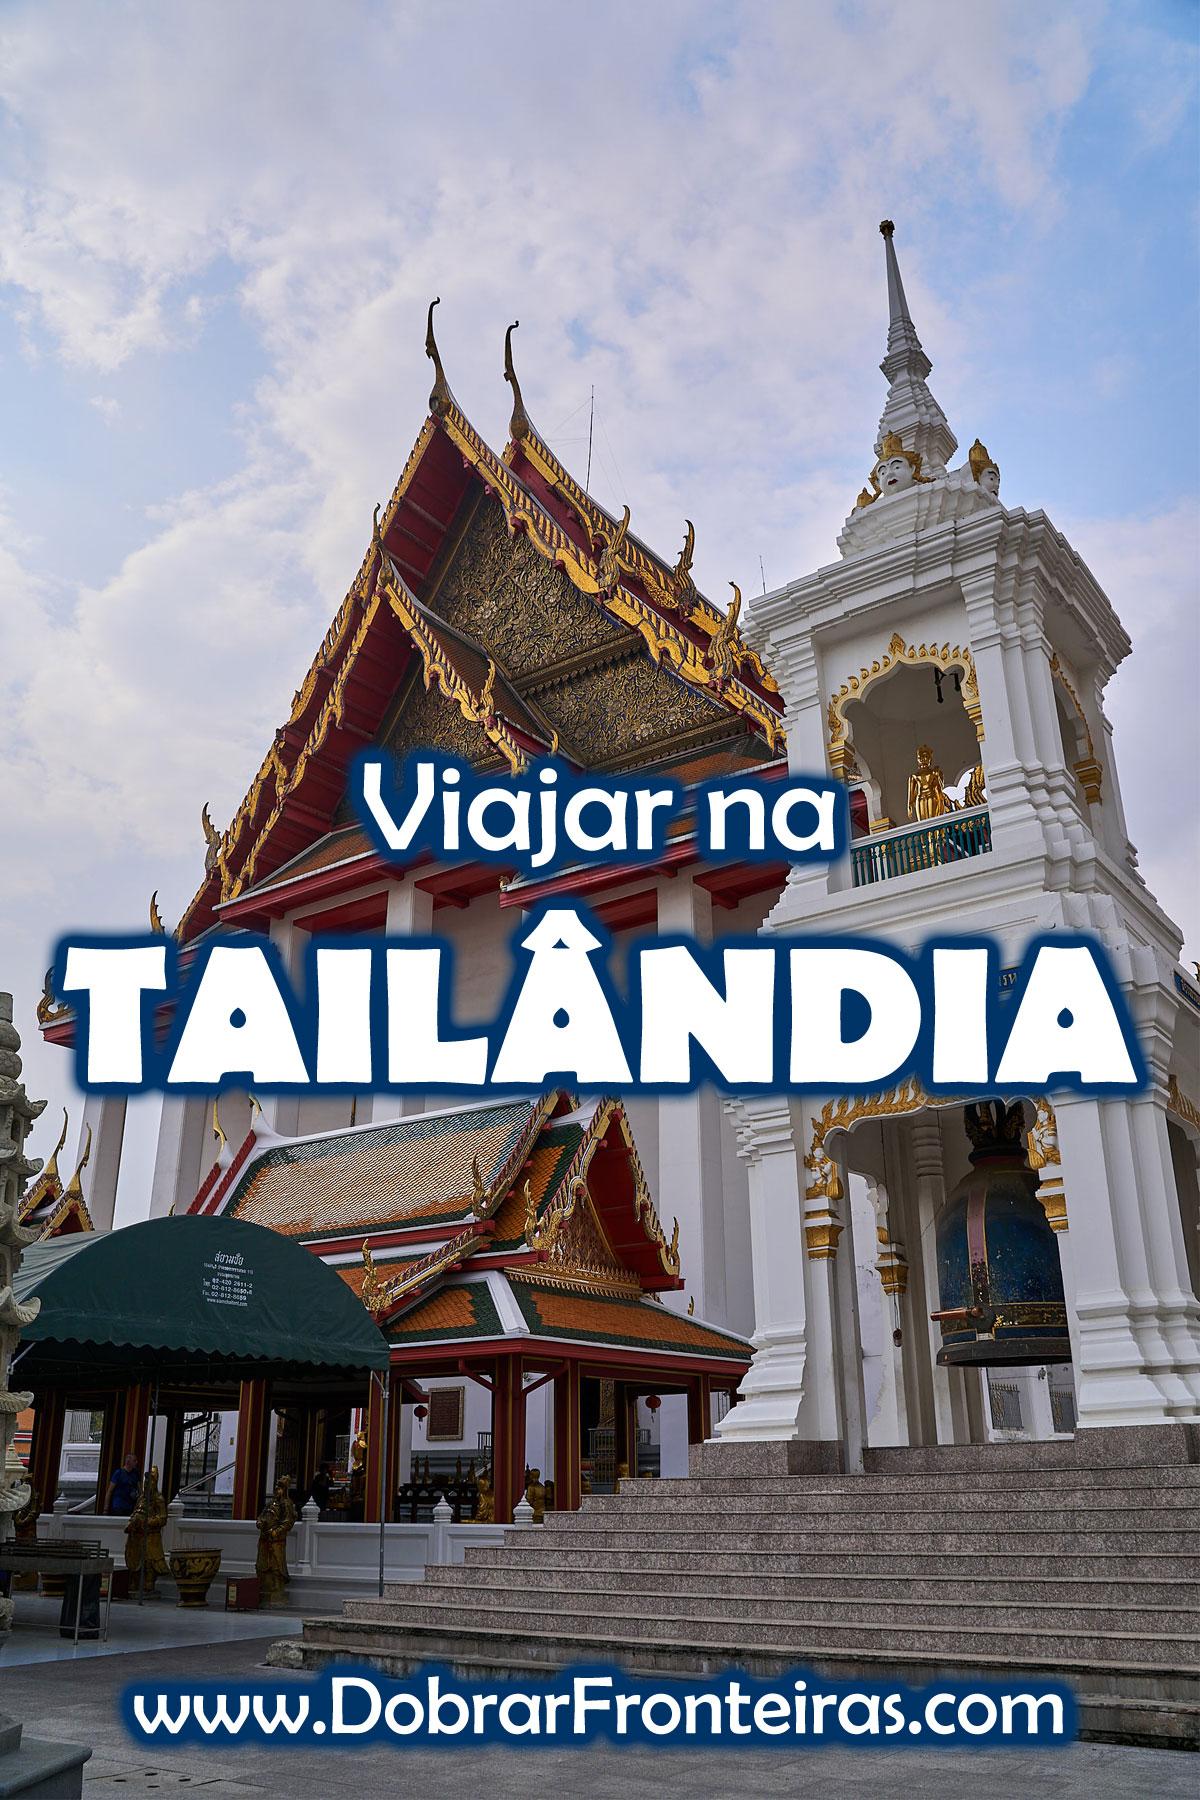 Viajar na Tailandia